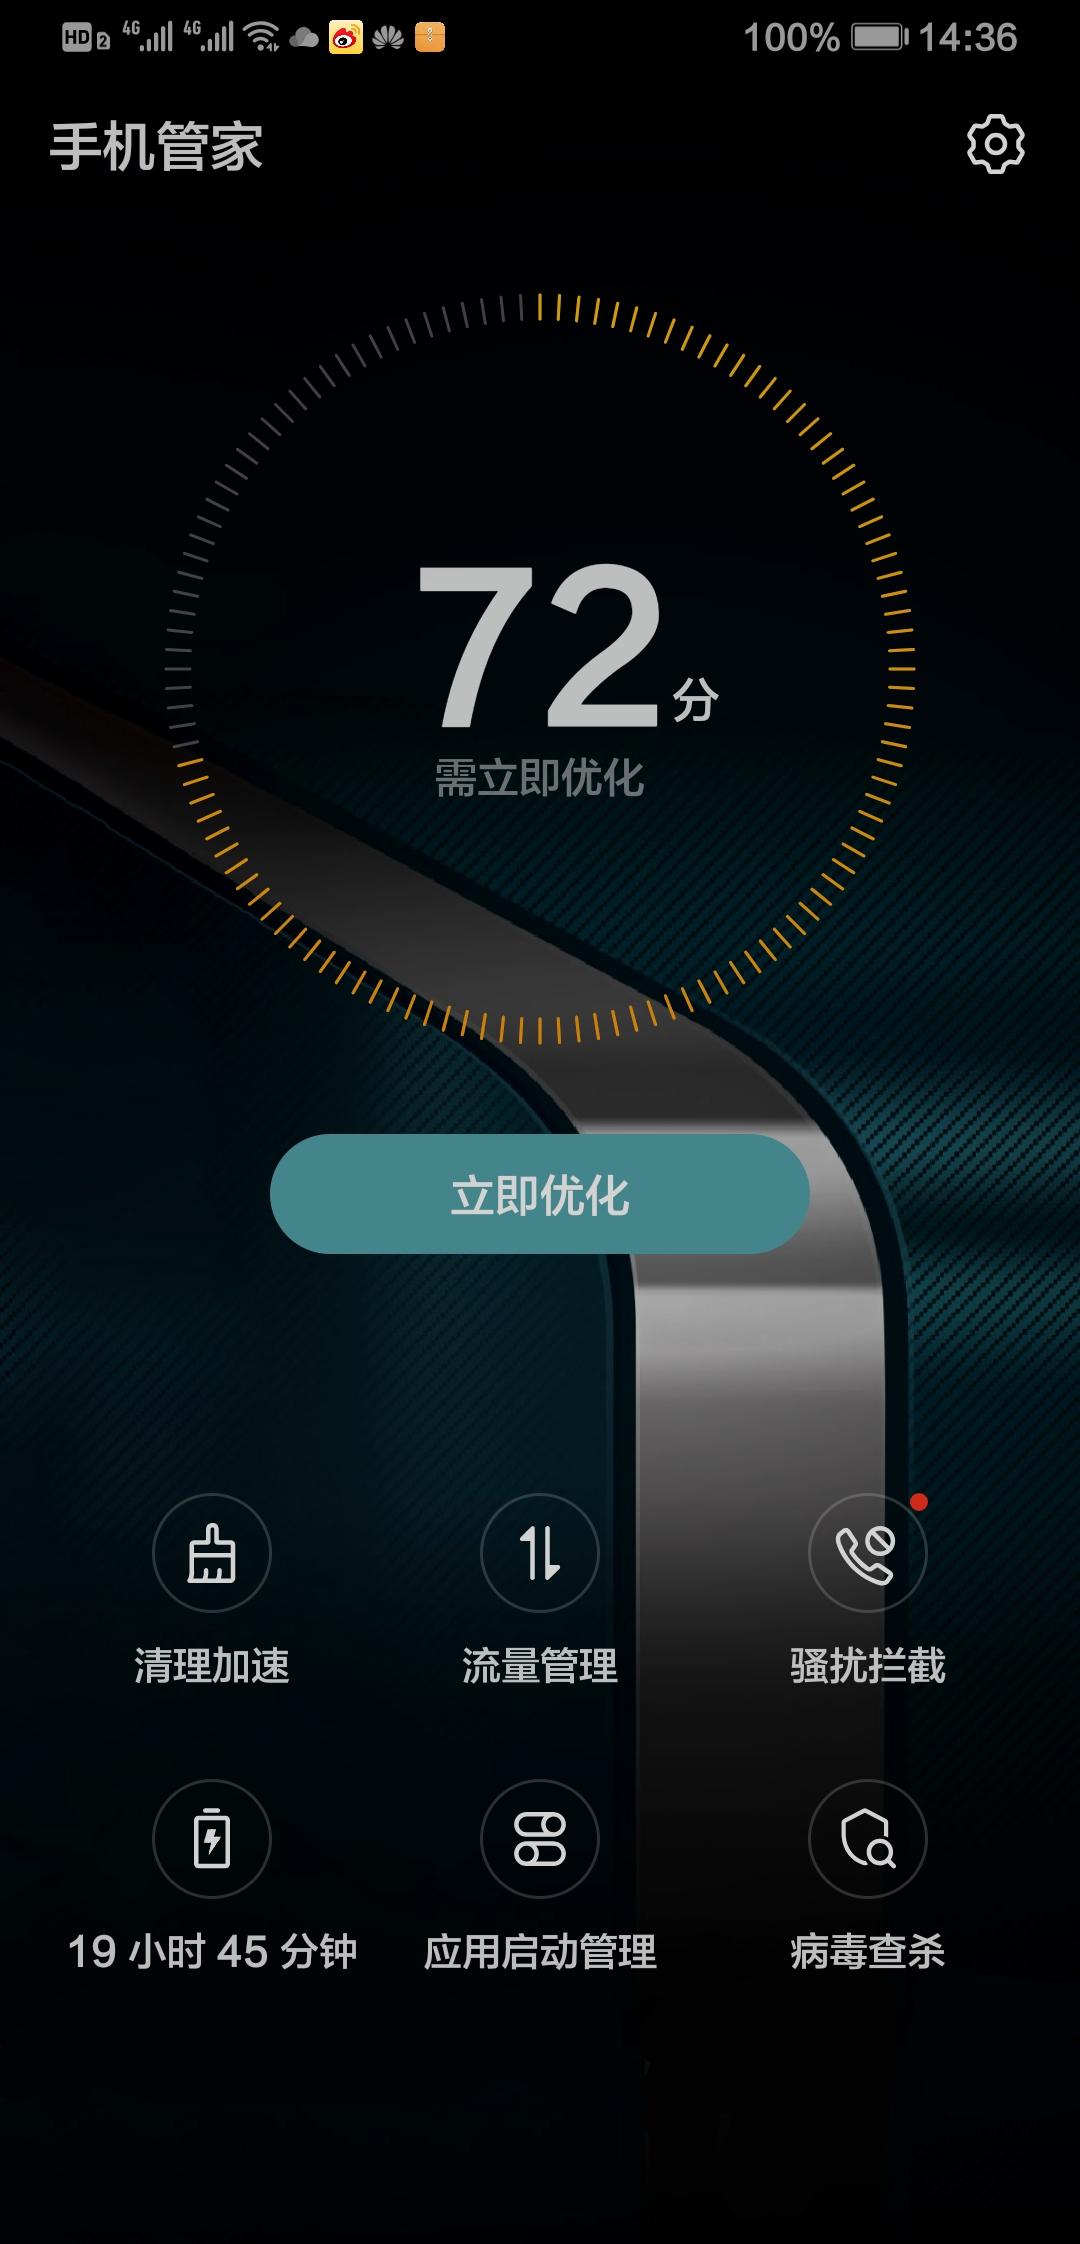 Screenshot_20190623_143628_com.huawei.systemmanager.jpg